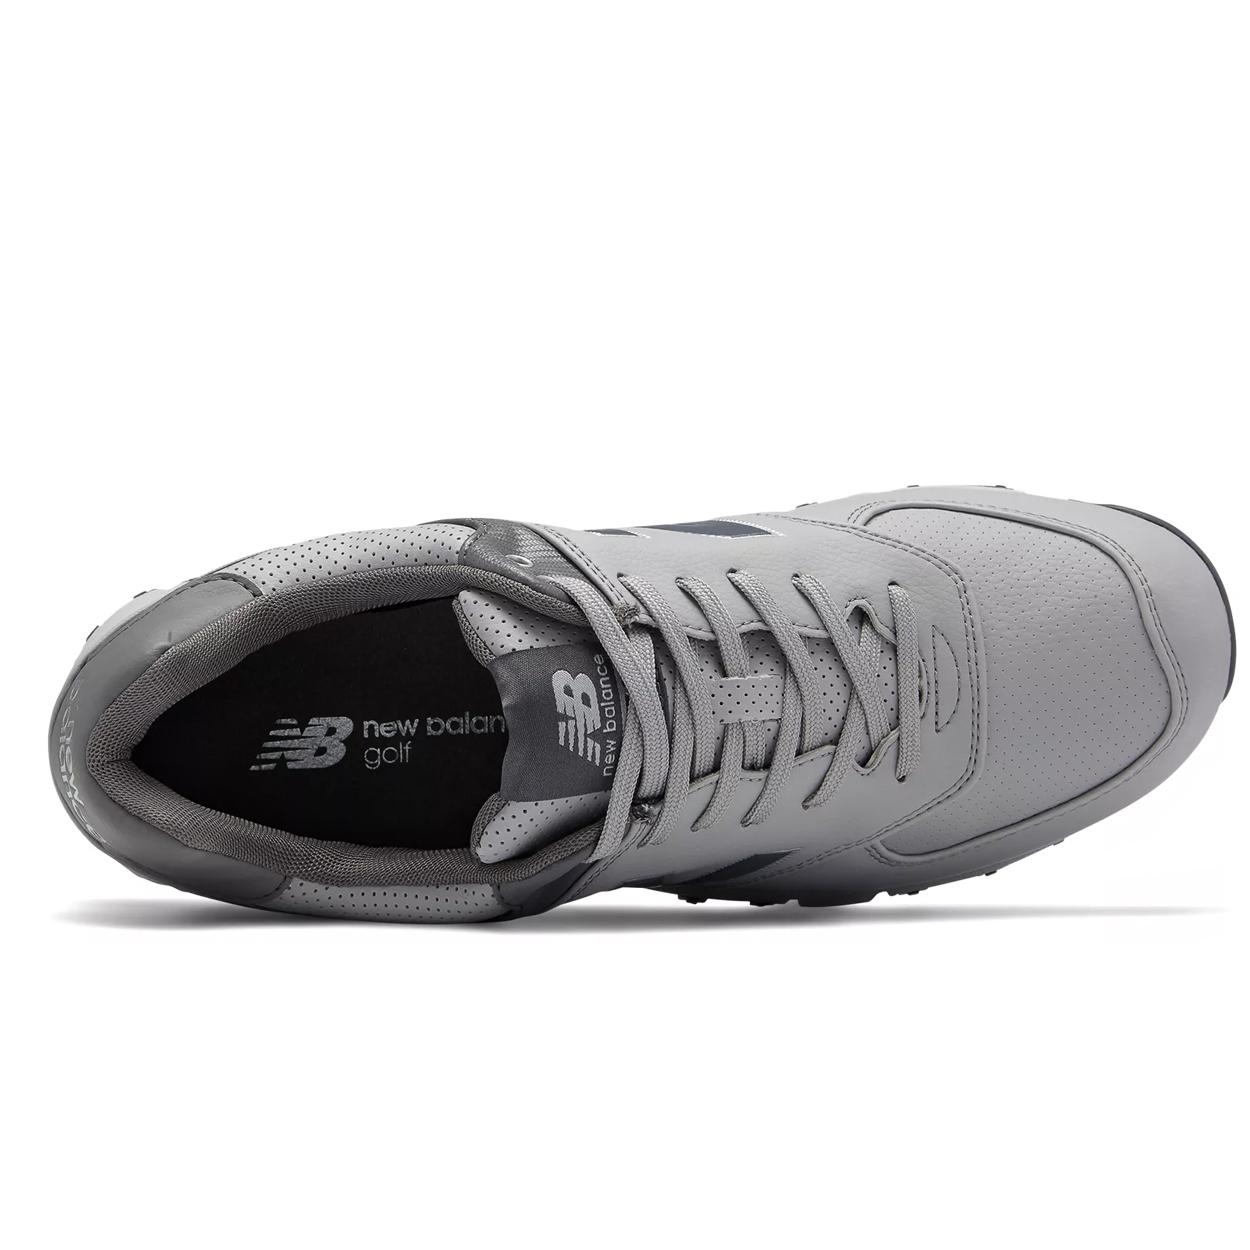 New-Balance-NBG574SL-Men-039-s-Spikeless-Microfiber-Leather-Golf-Shoe-New thumbnail 8